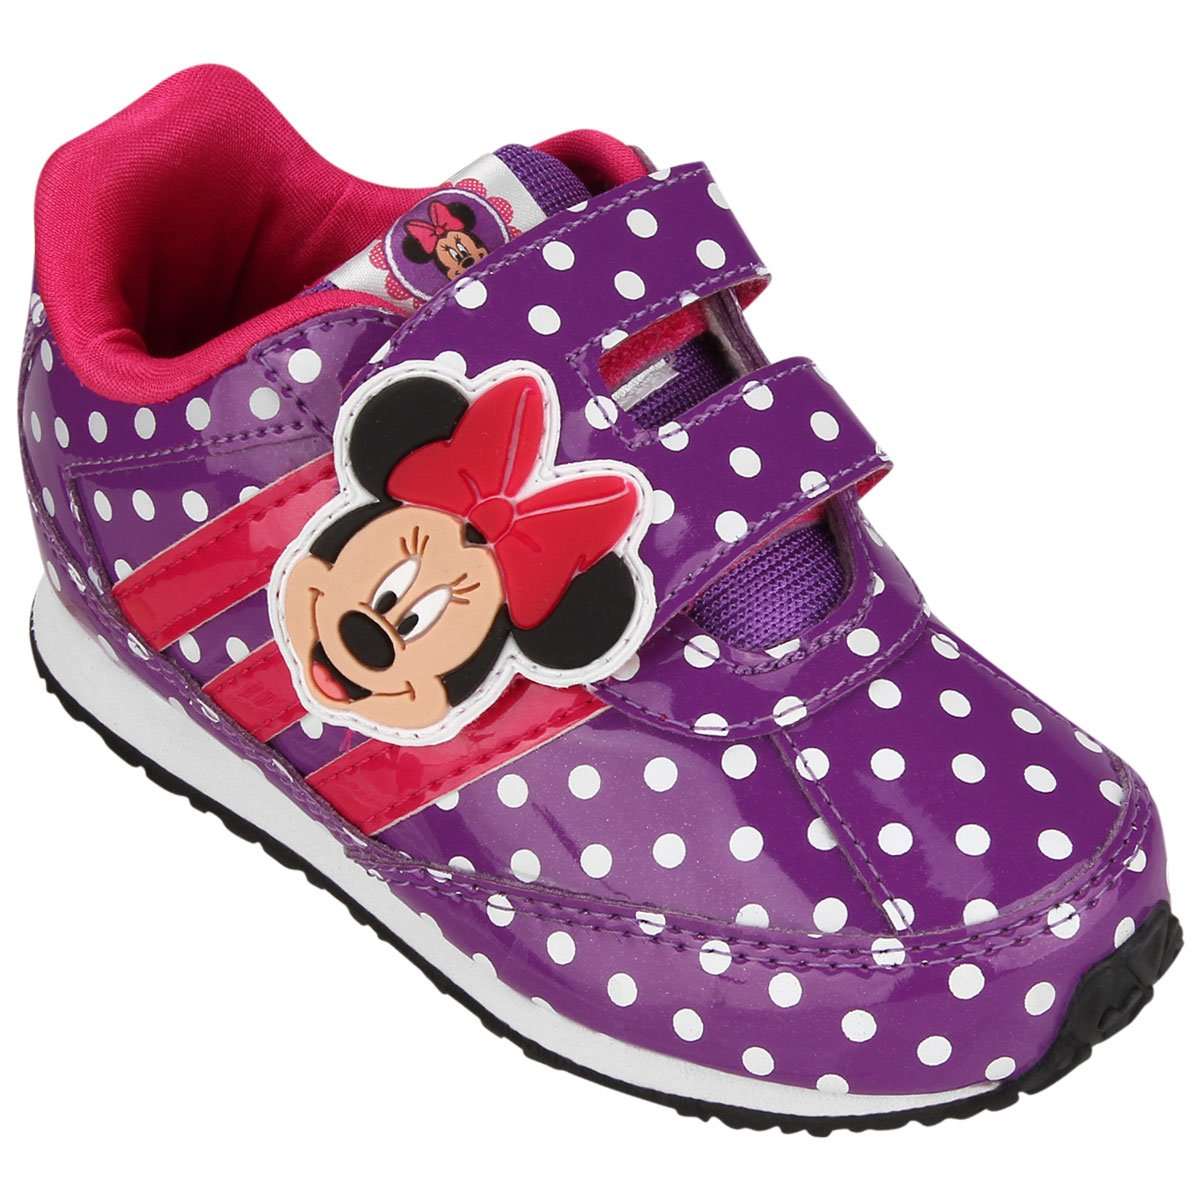 1f98d83013f Tênis Adidas Disney Minnie CF Infantil - Compre Agora